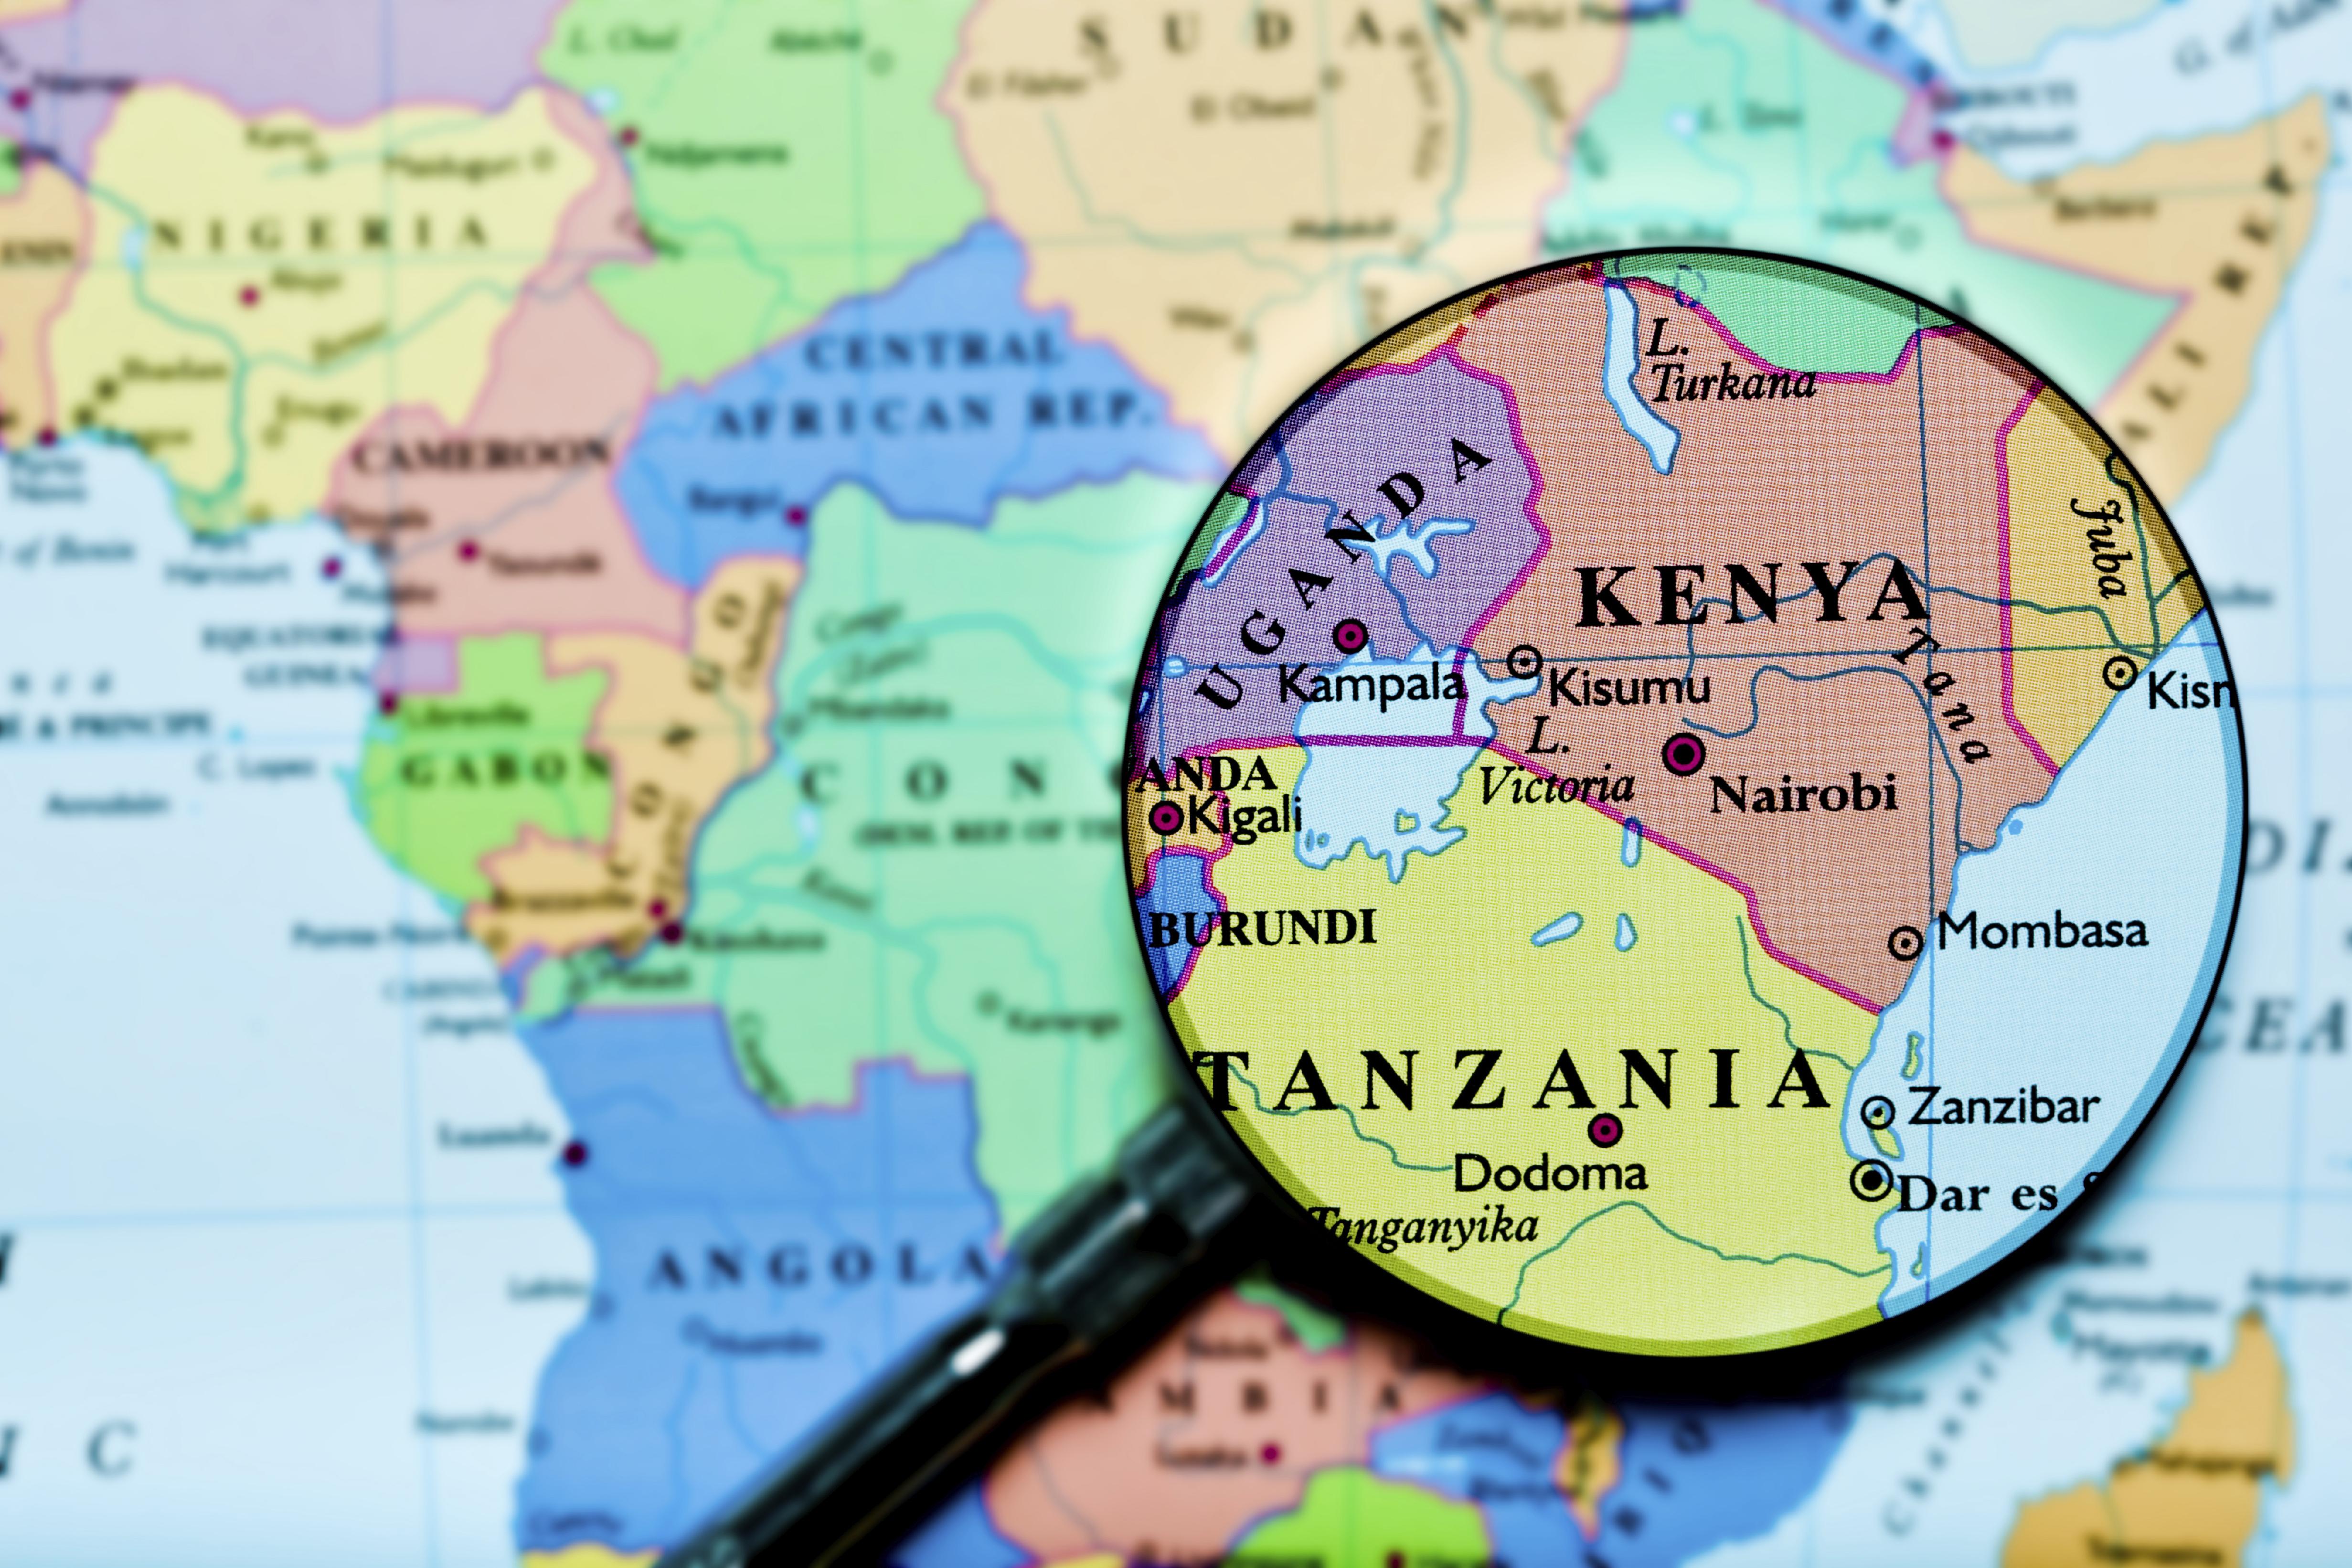 Map Of Africa Tanzania.Tanzania Vs Kenya Best Safari Country In Africa Compare Kenya